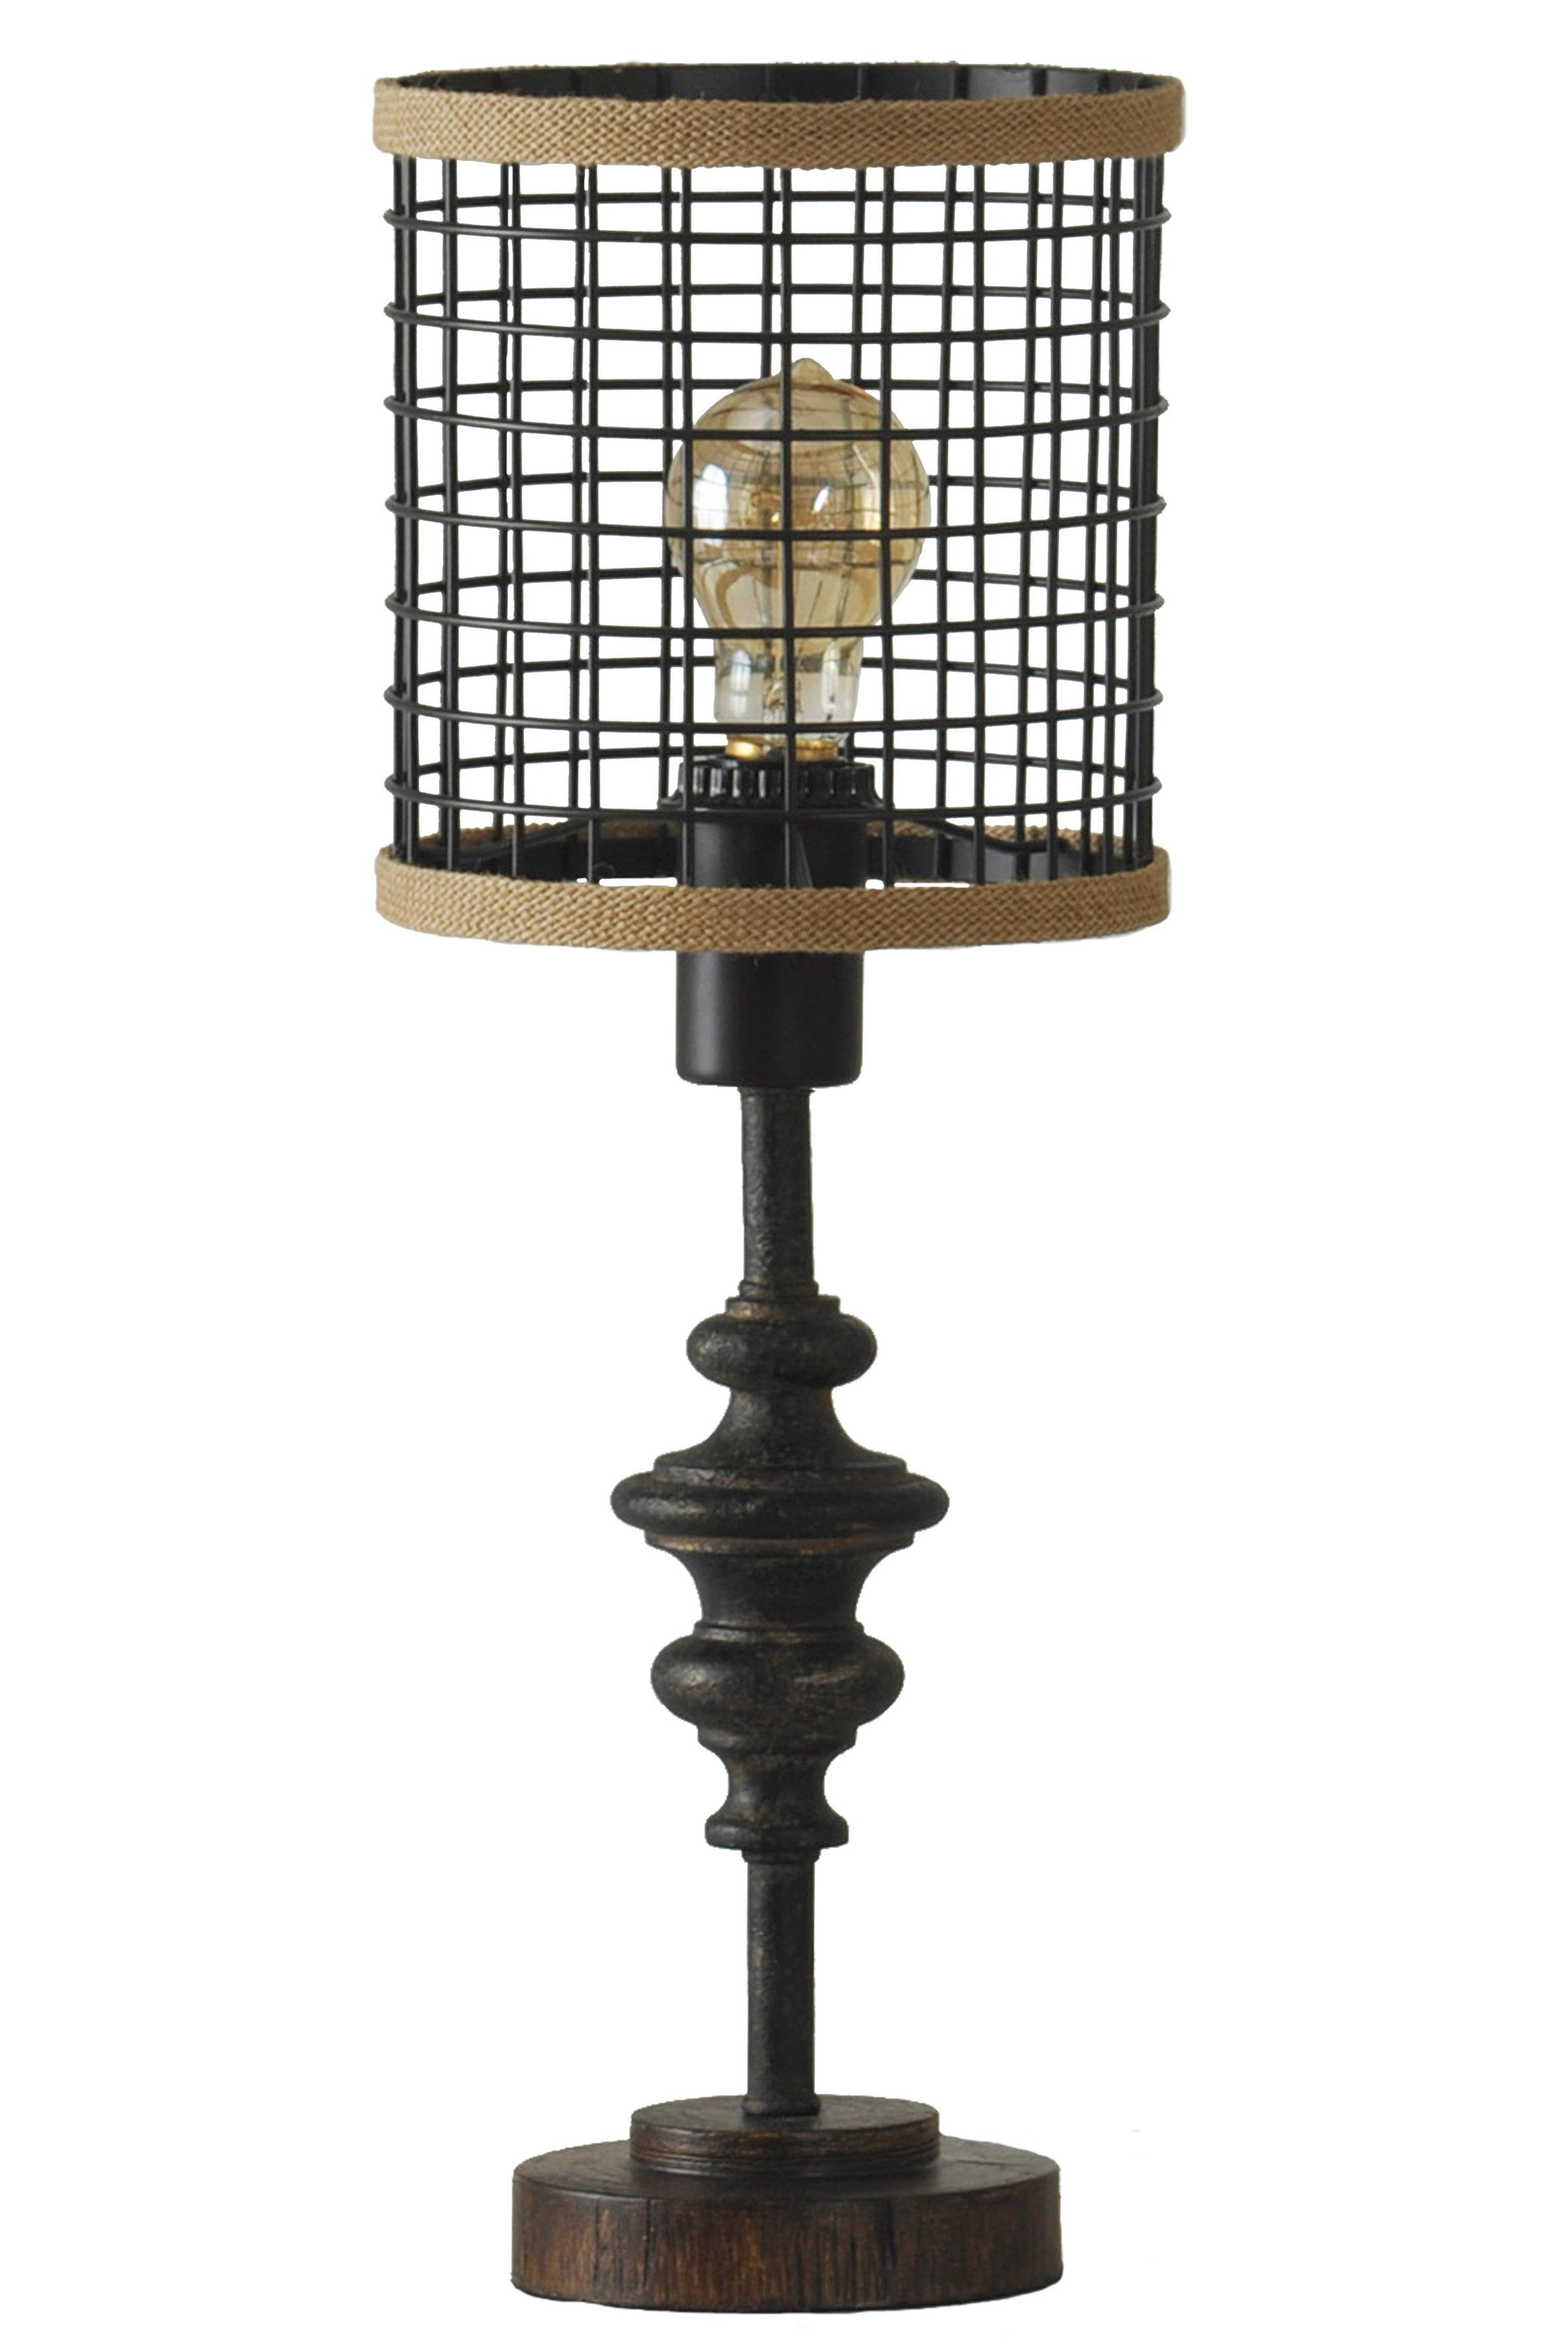 Gaston Industrial Table Lamp